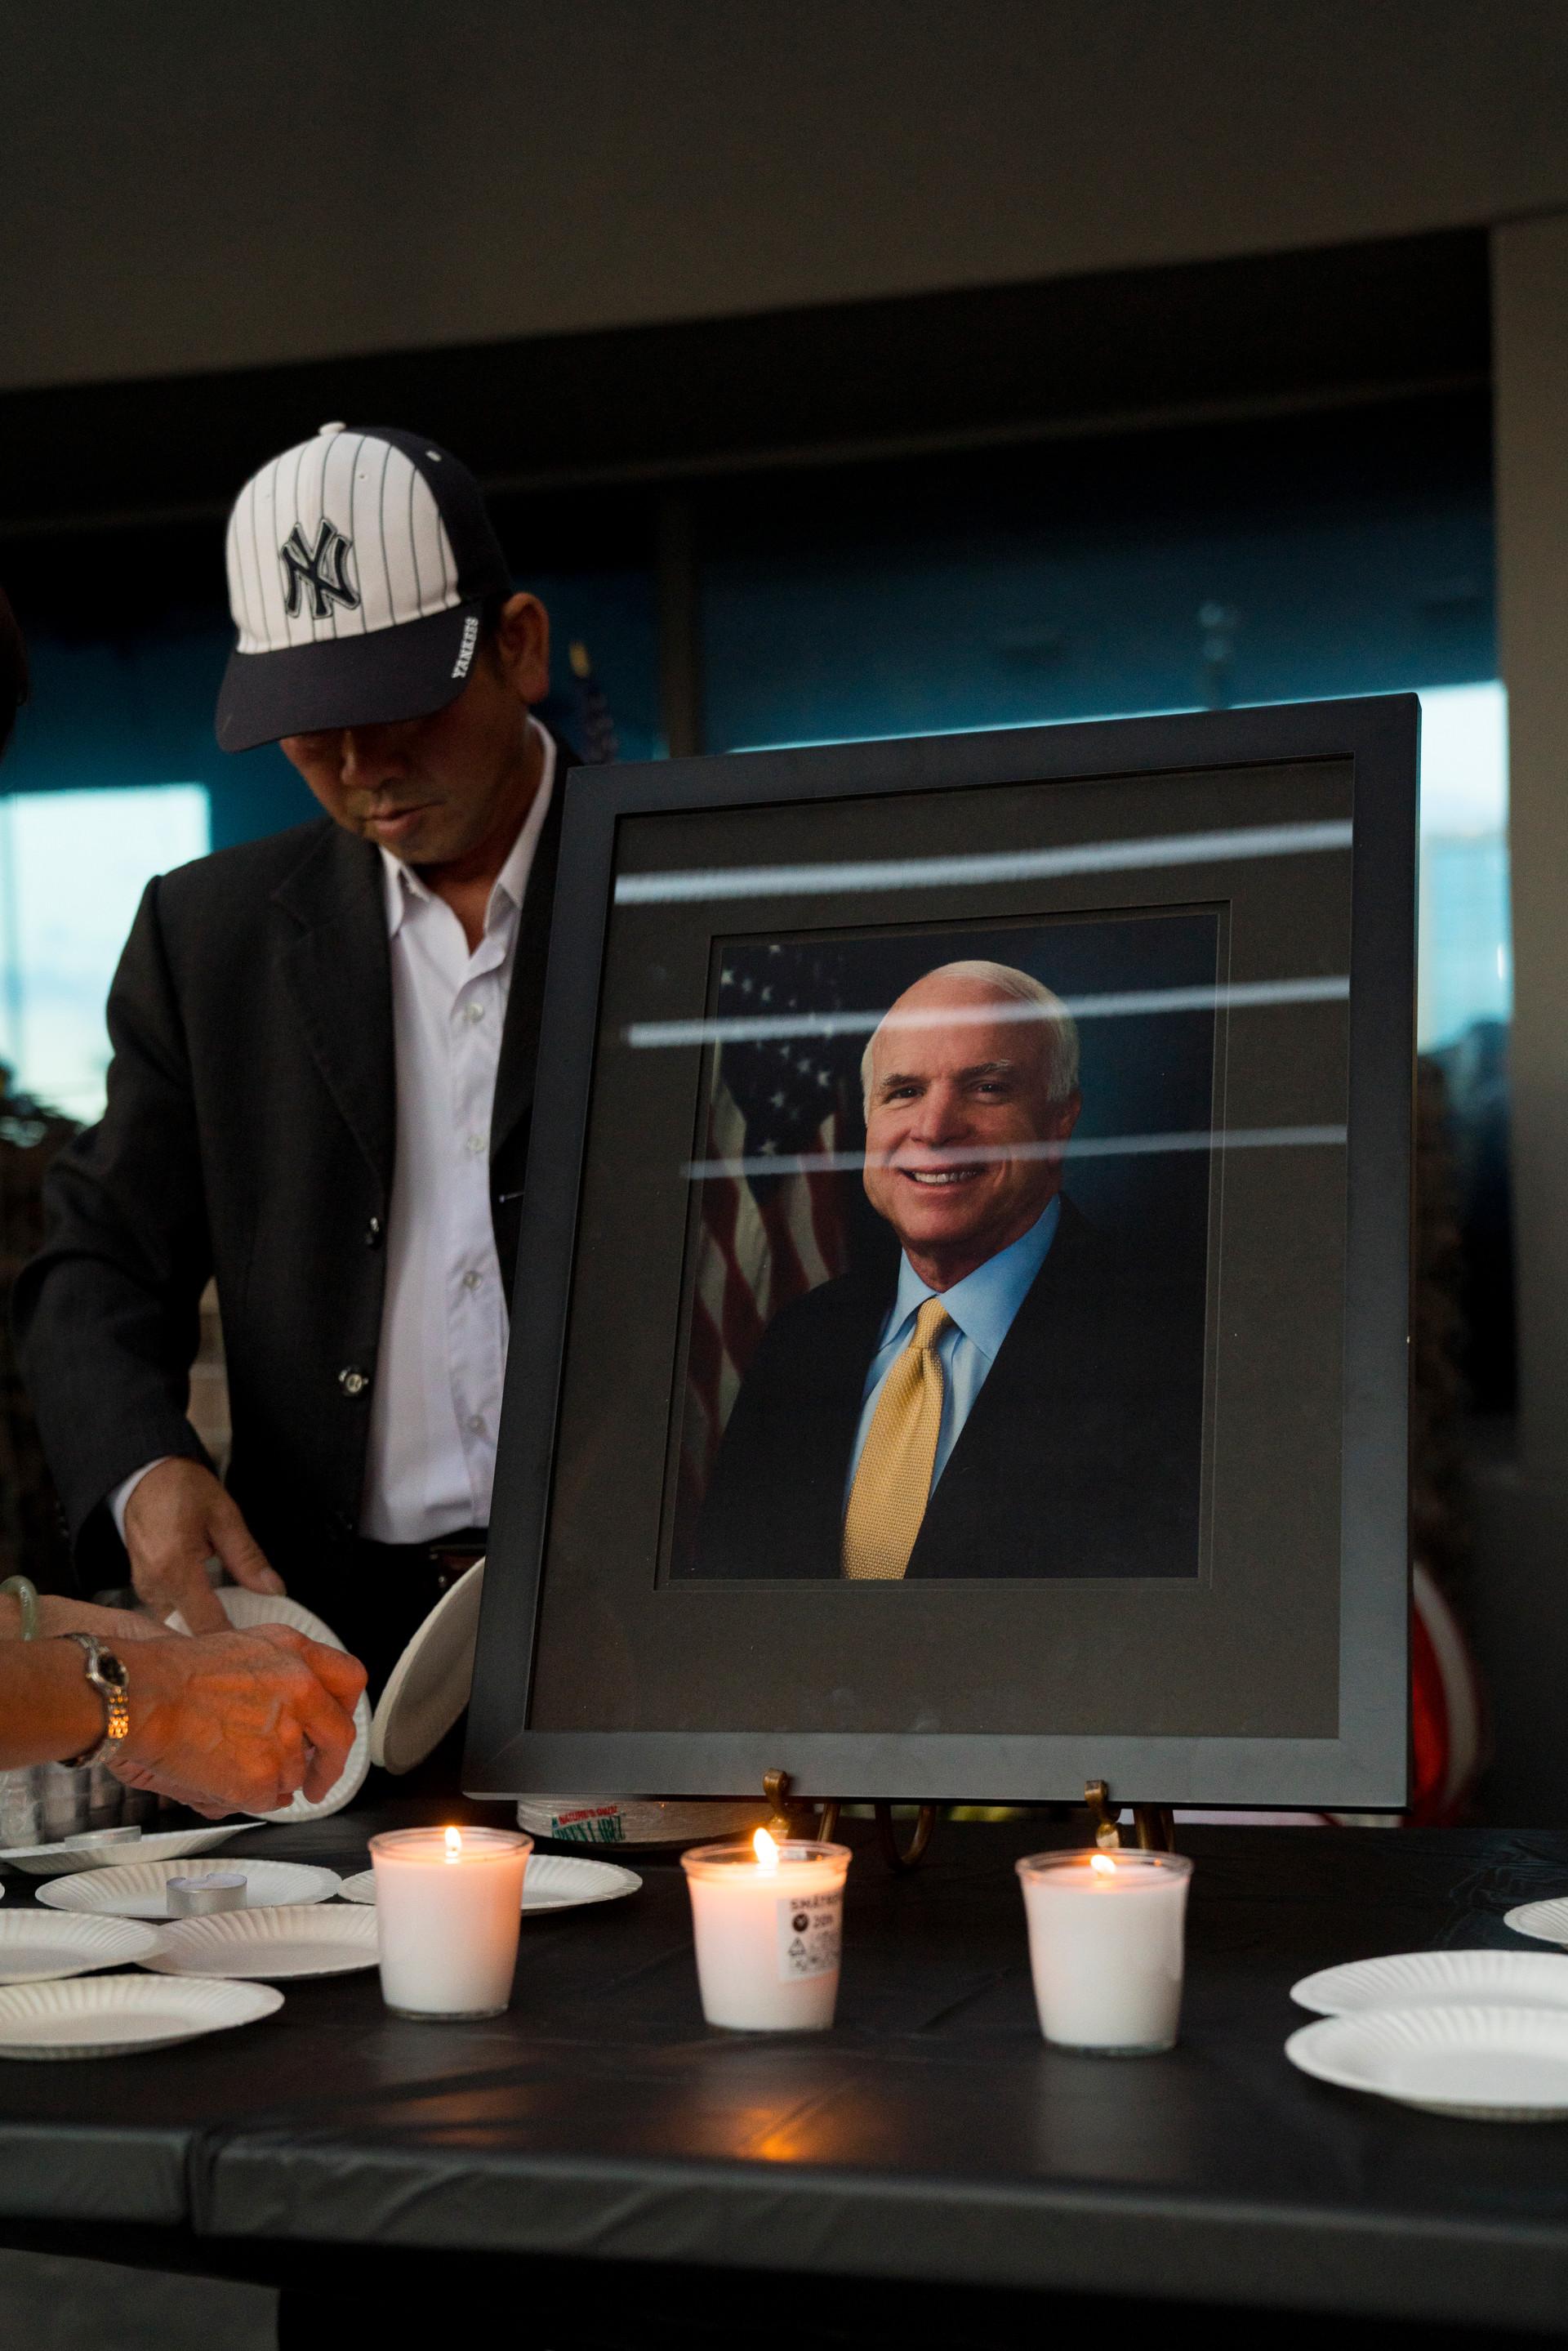 Portrait of Senator John McCain Vietnamese Association of Arizona memorial for McCain at his office in Phoenix, Arizona on Sunday, August 26, 2018.